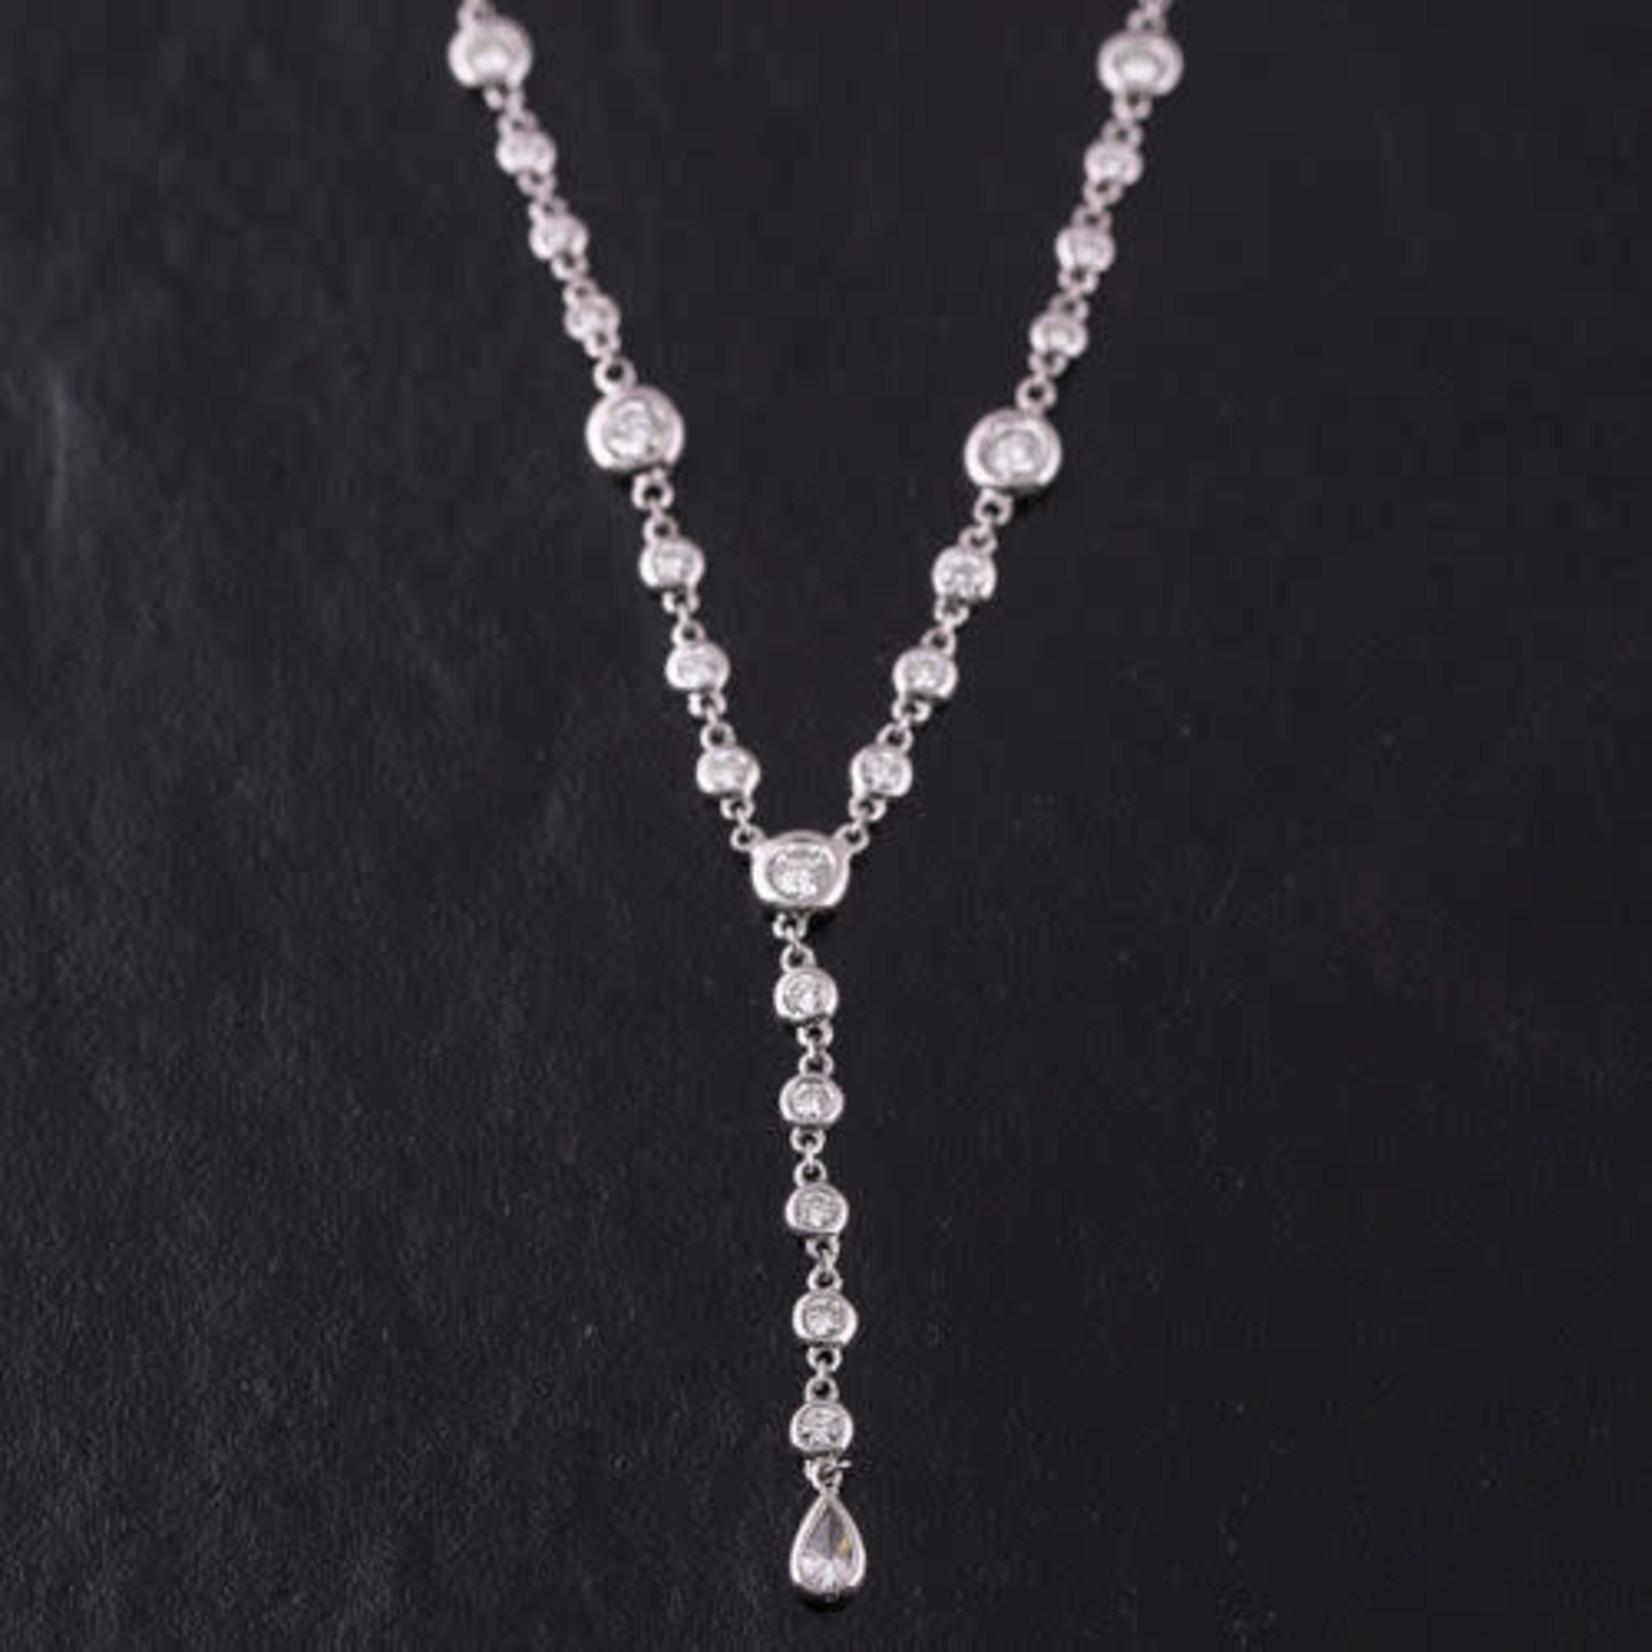 14KW Gold Diamond 1.40ctw Bezel Set Lariat Chain Necklace